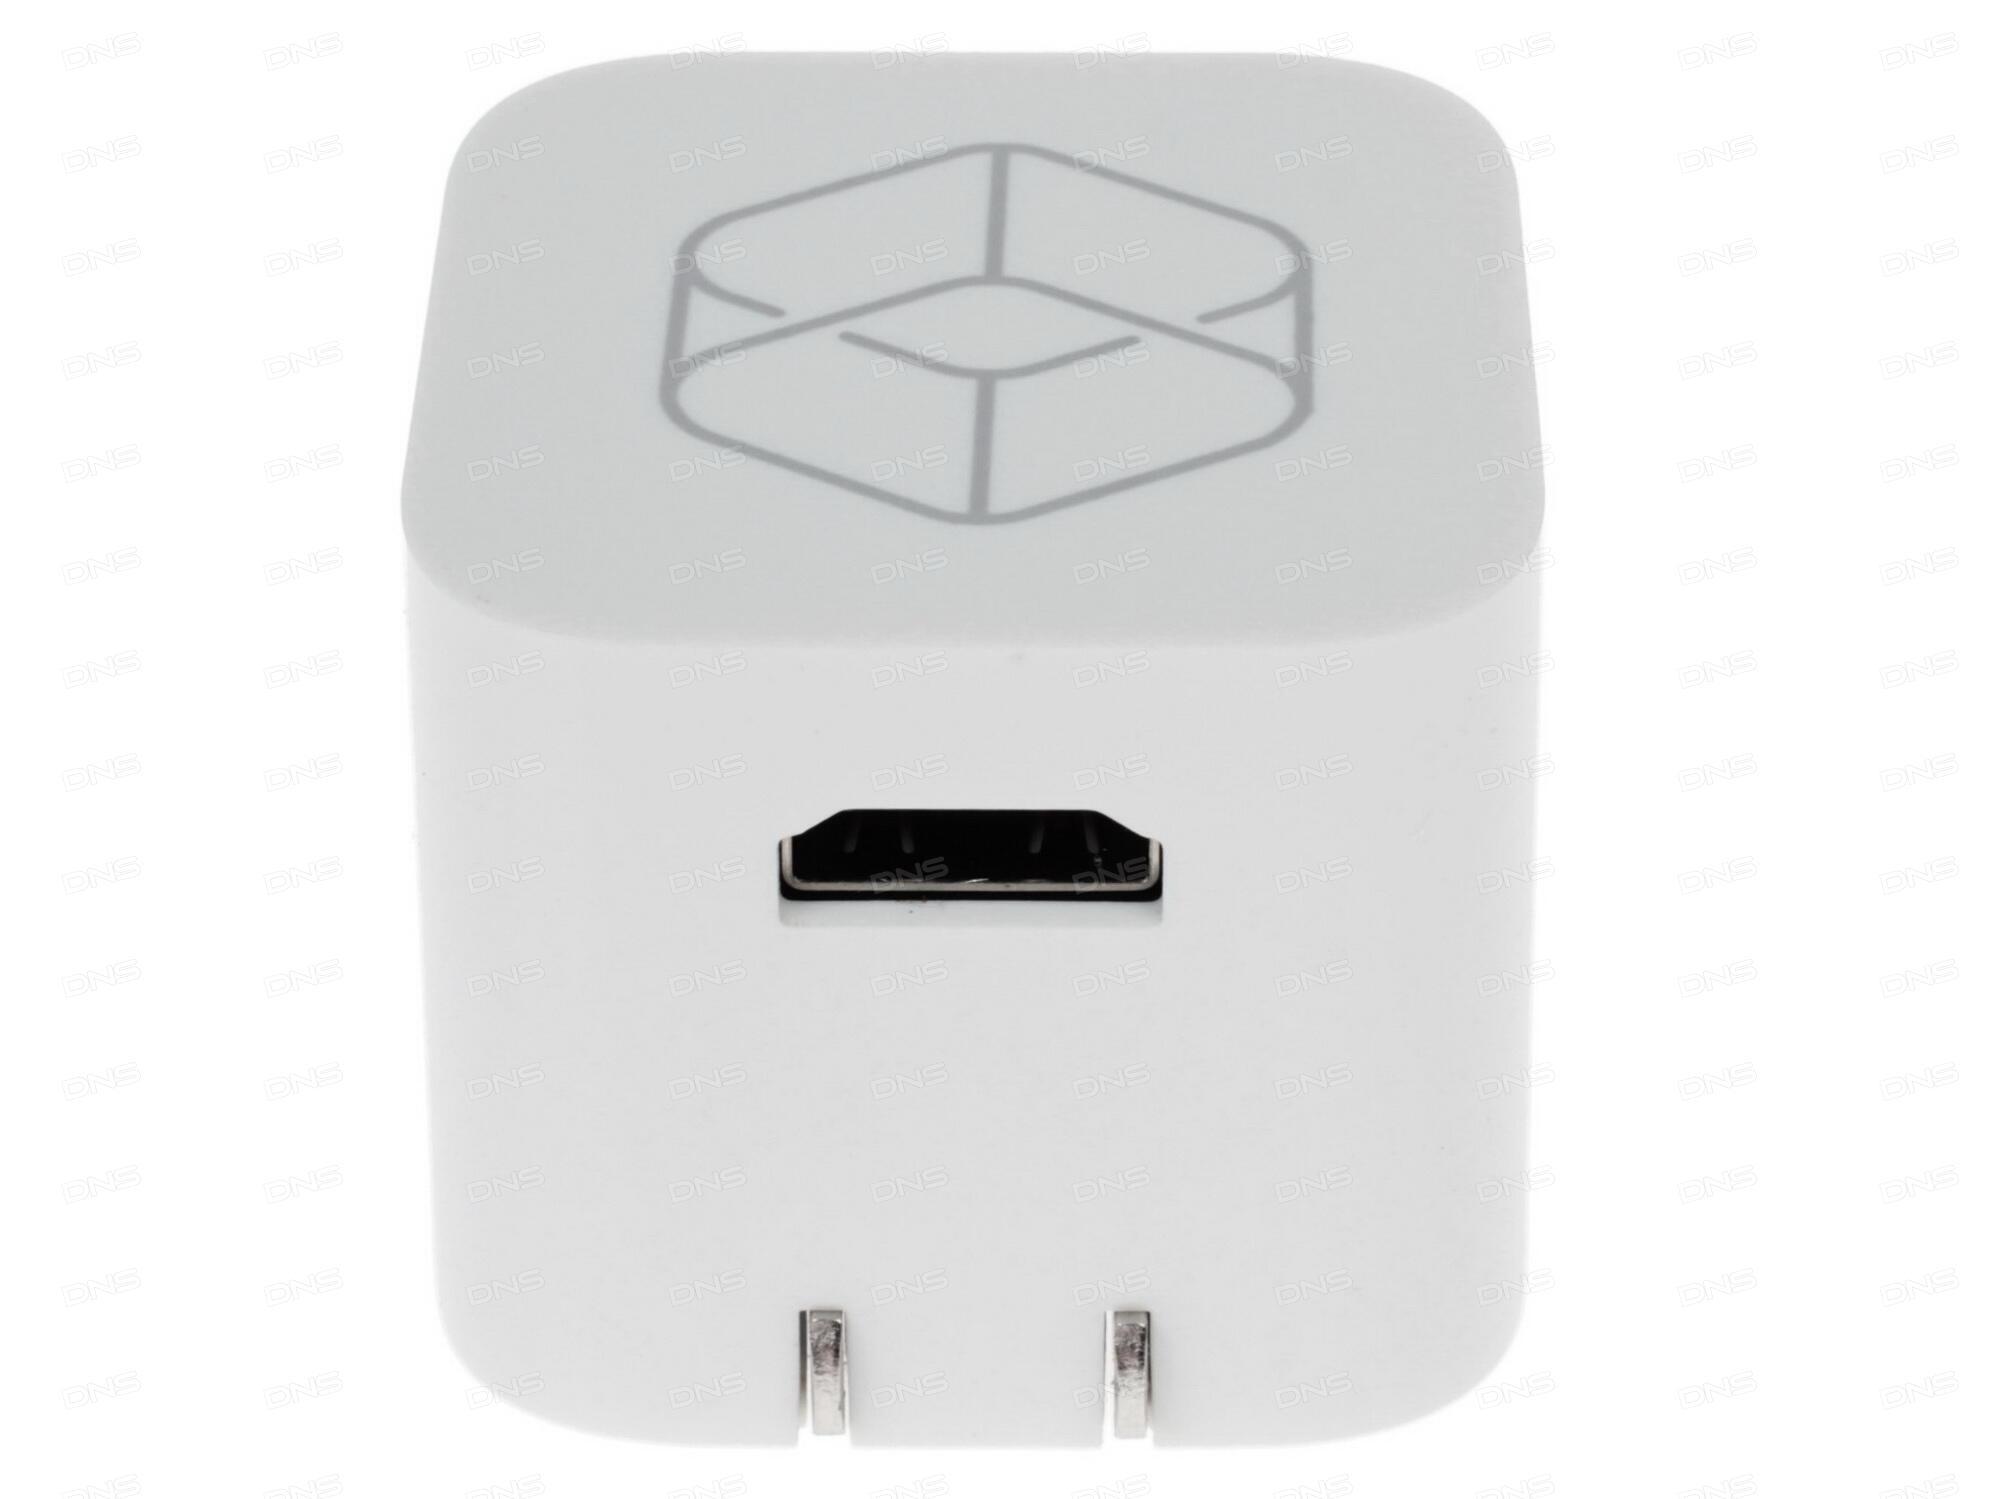 Медиаплеер Rombica Smart Box Quad T2 SBQ-T2805 v001